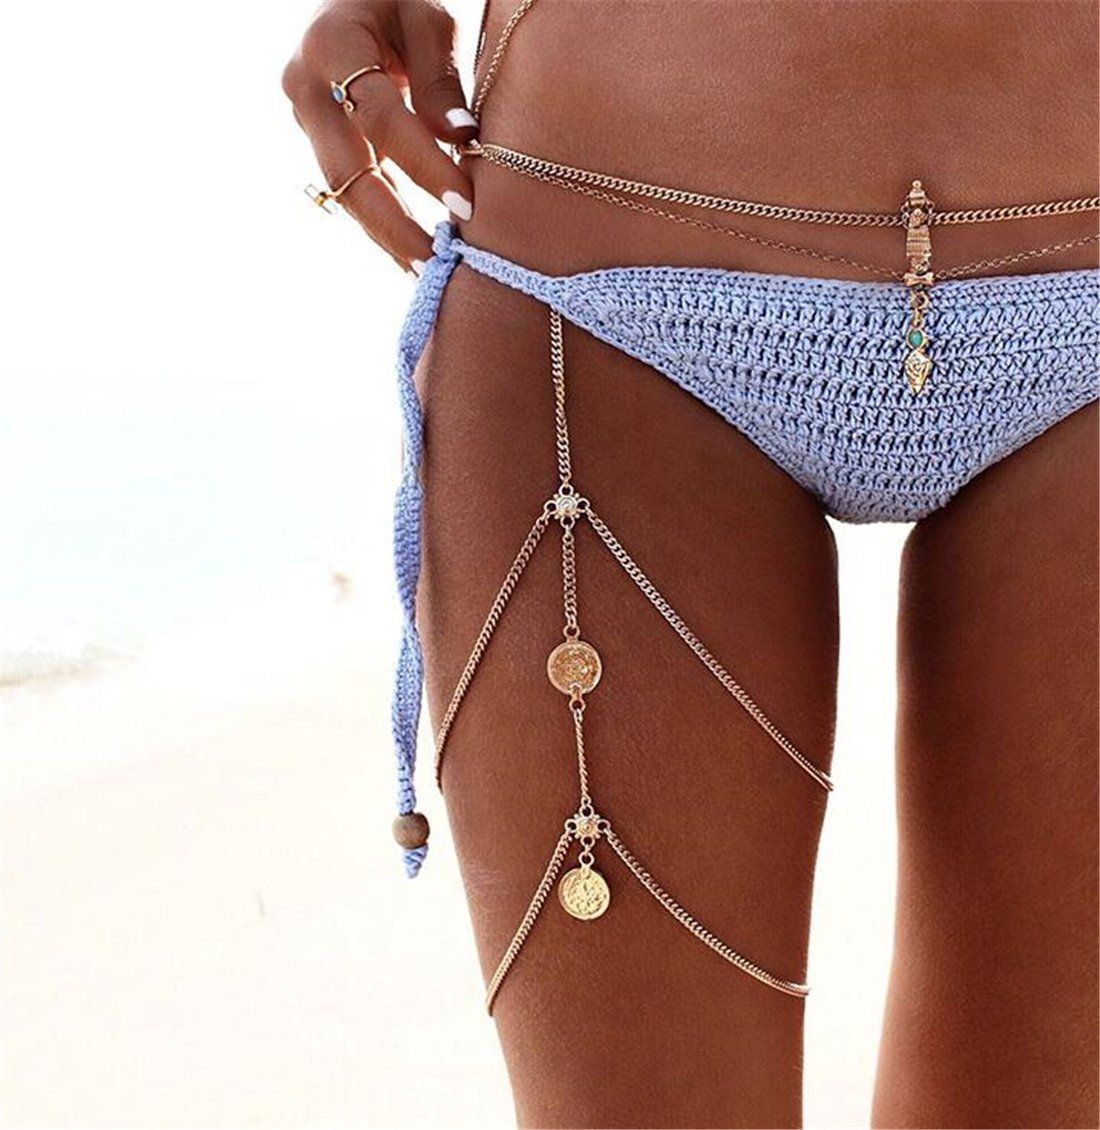 Tmrow 1pc Simple Women Body Jewelry Handmade Chain Tassel Thigh Leg Chain Bracelet,Gold